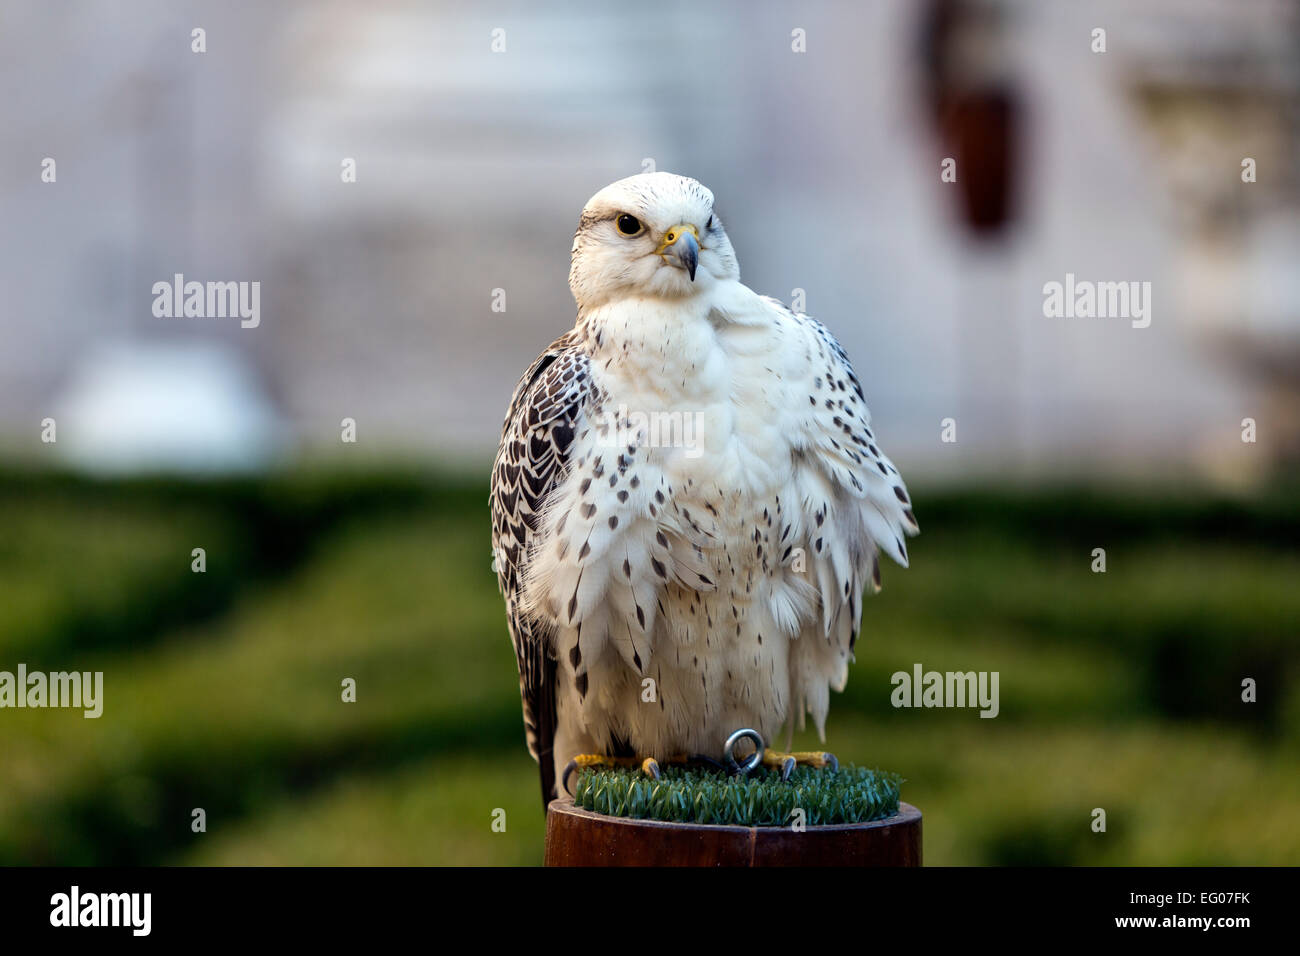 Gyrfalcon Falconry in Mafra National Palace - Stock Image